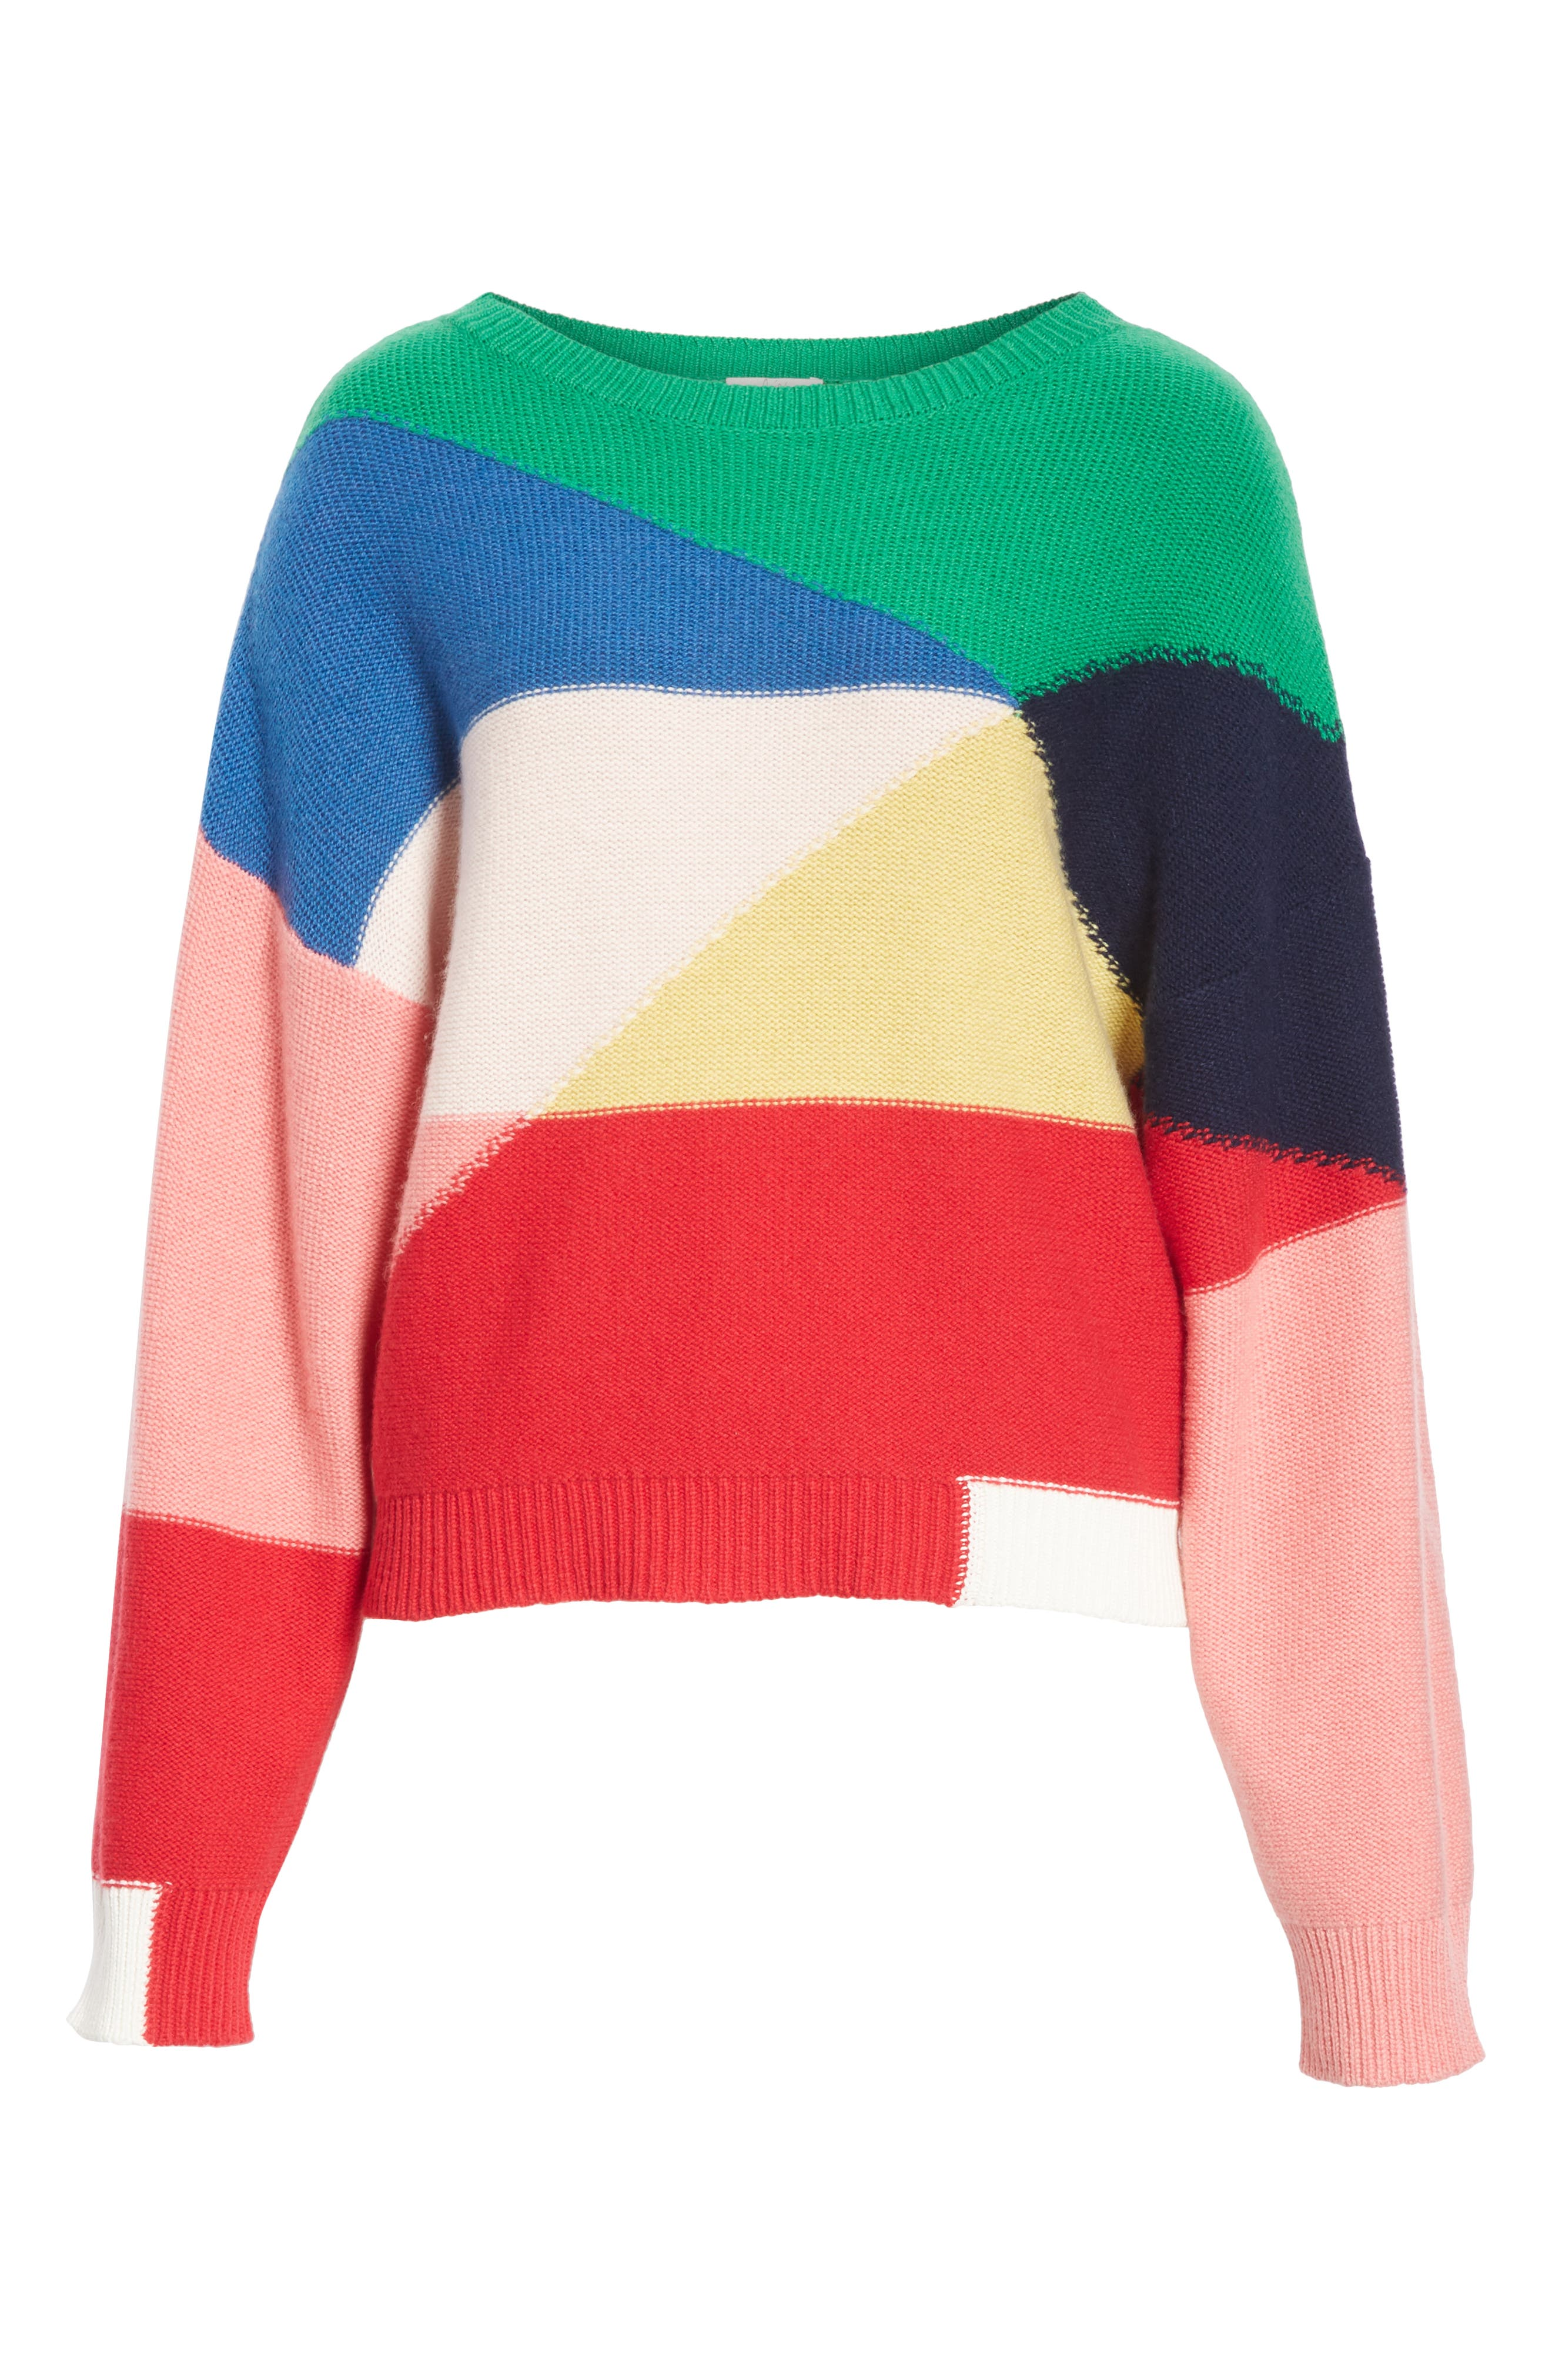 Megu Colorblock Wool & Cashmere Sweater,                             Alternate thumbnail 6, color,                             Multi